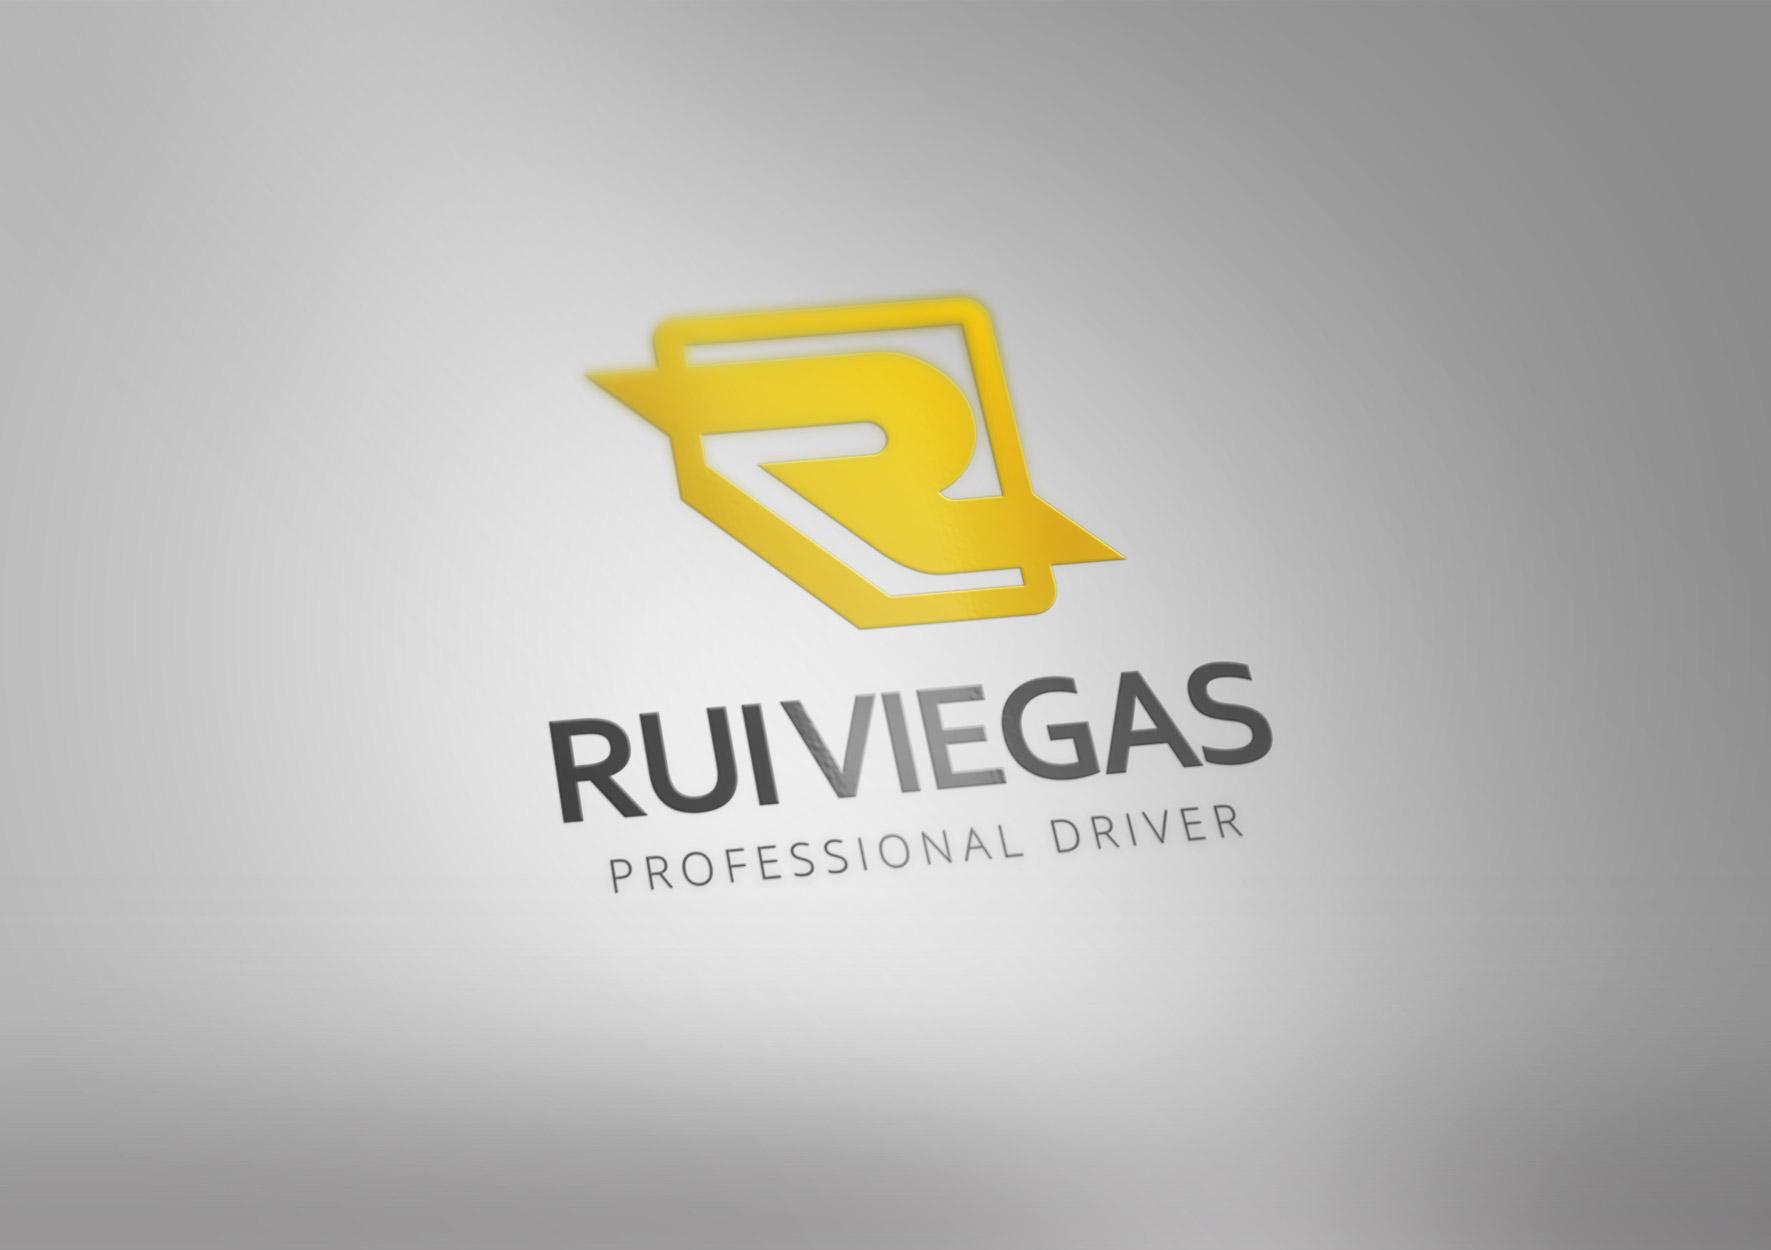 Rui Viegas Professional Driver - portfolio d-sign Ana Cláudia